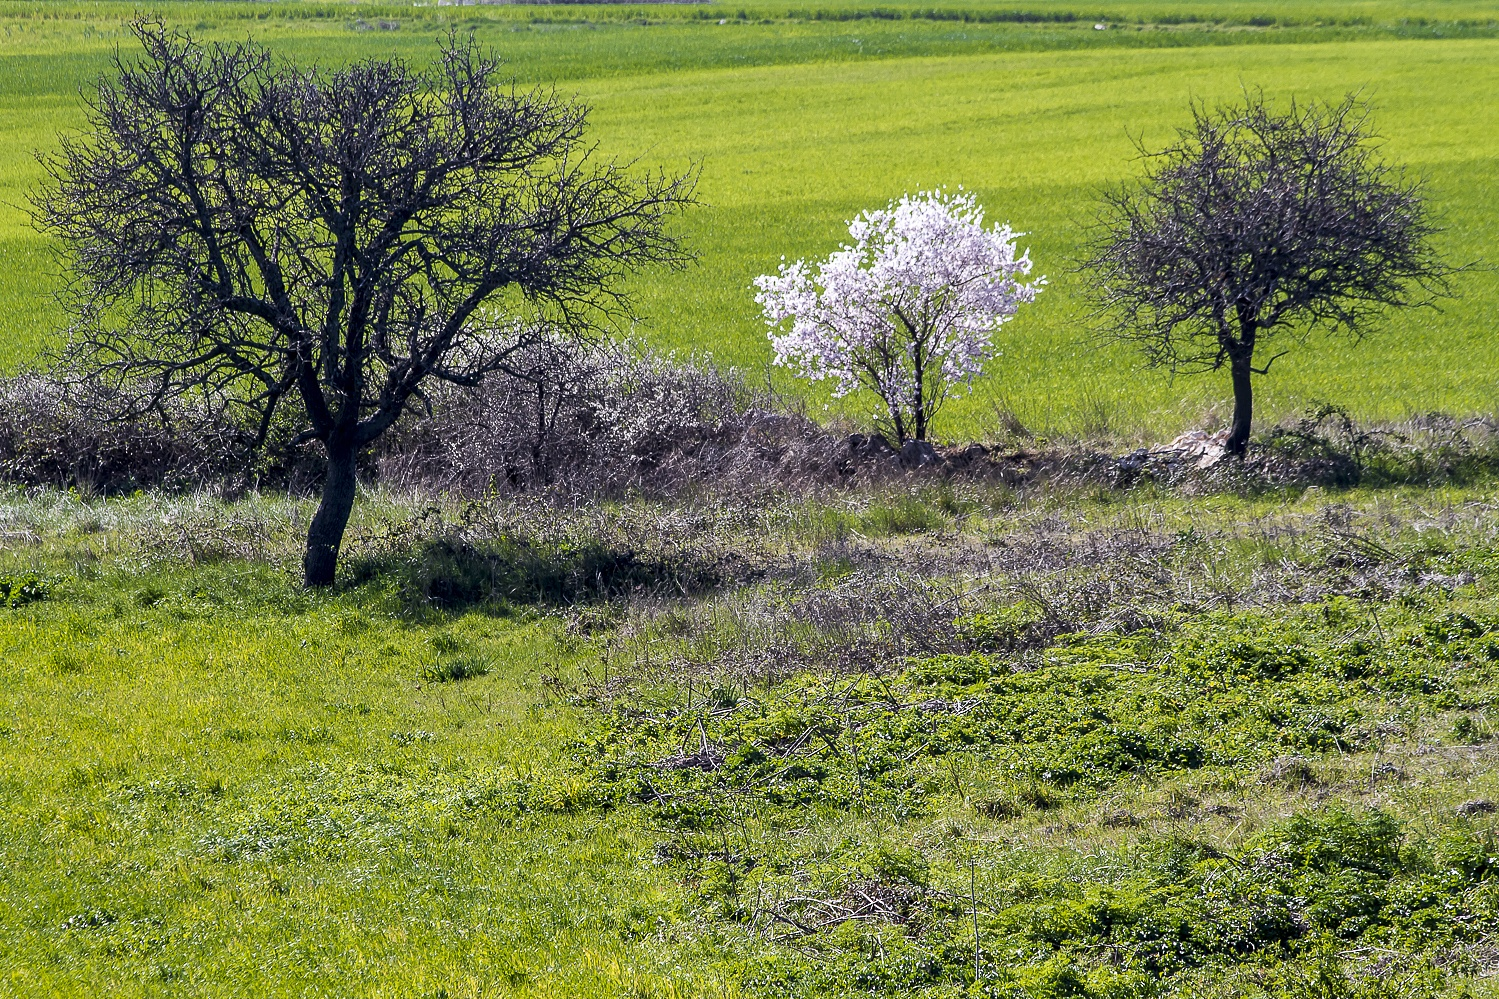 Murgia national park 2  by giuseppe.schiavone.338